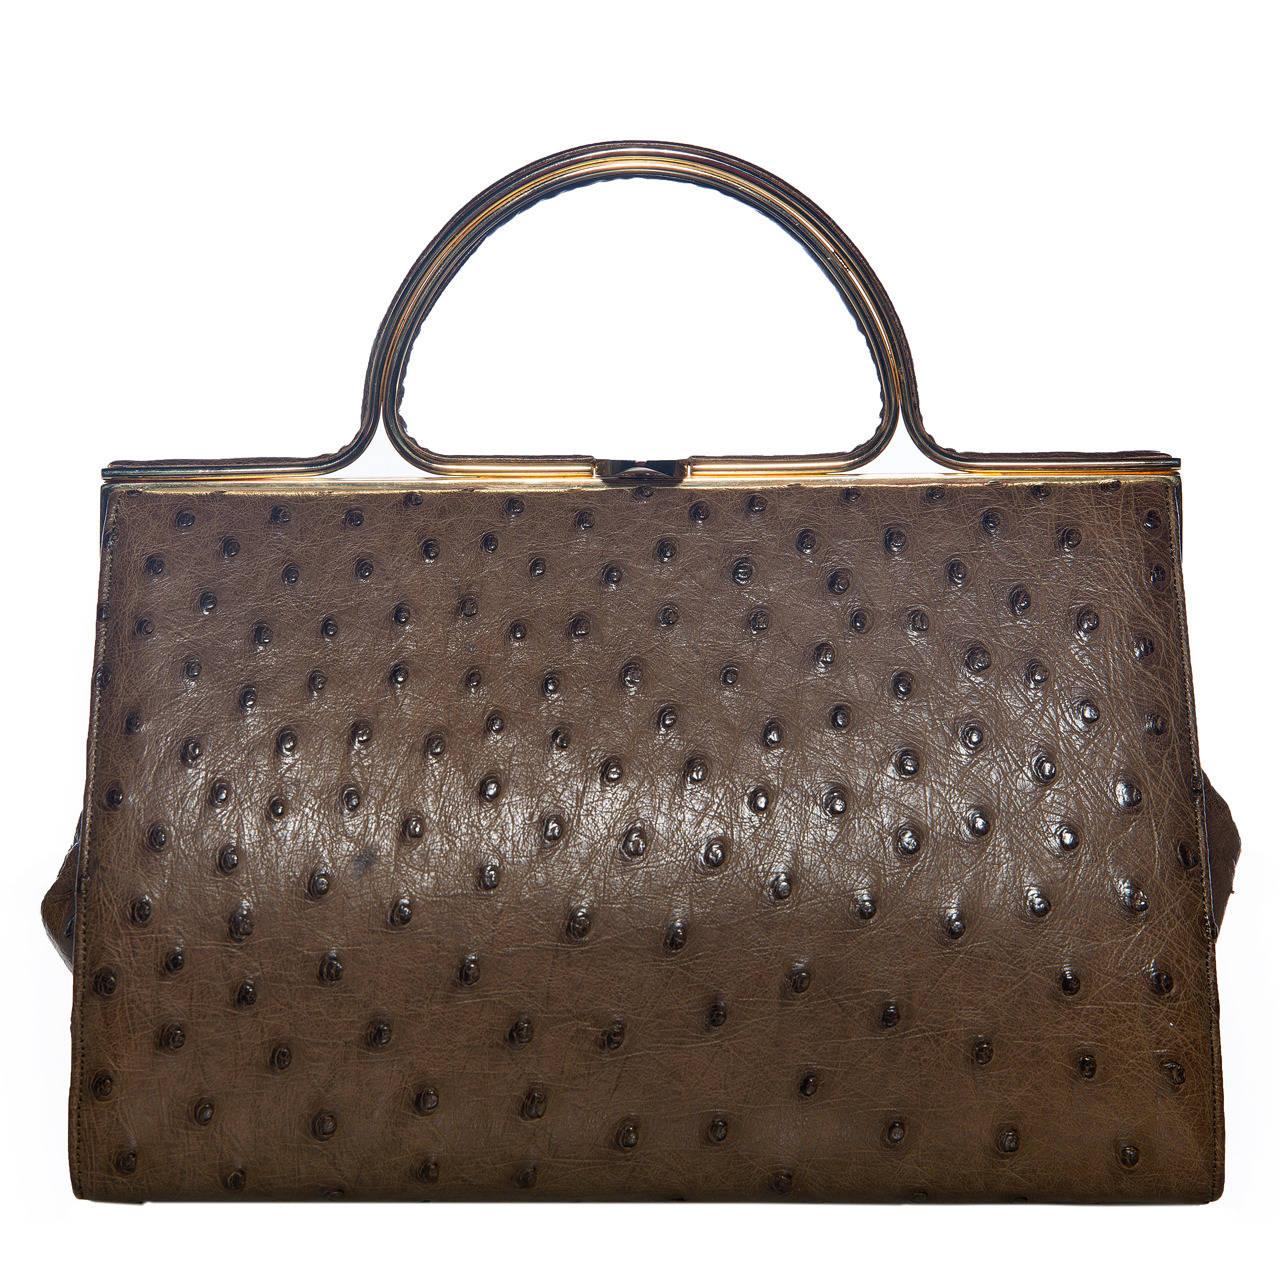 Judith Leiber Ostrich Handbag at 1stdibs